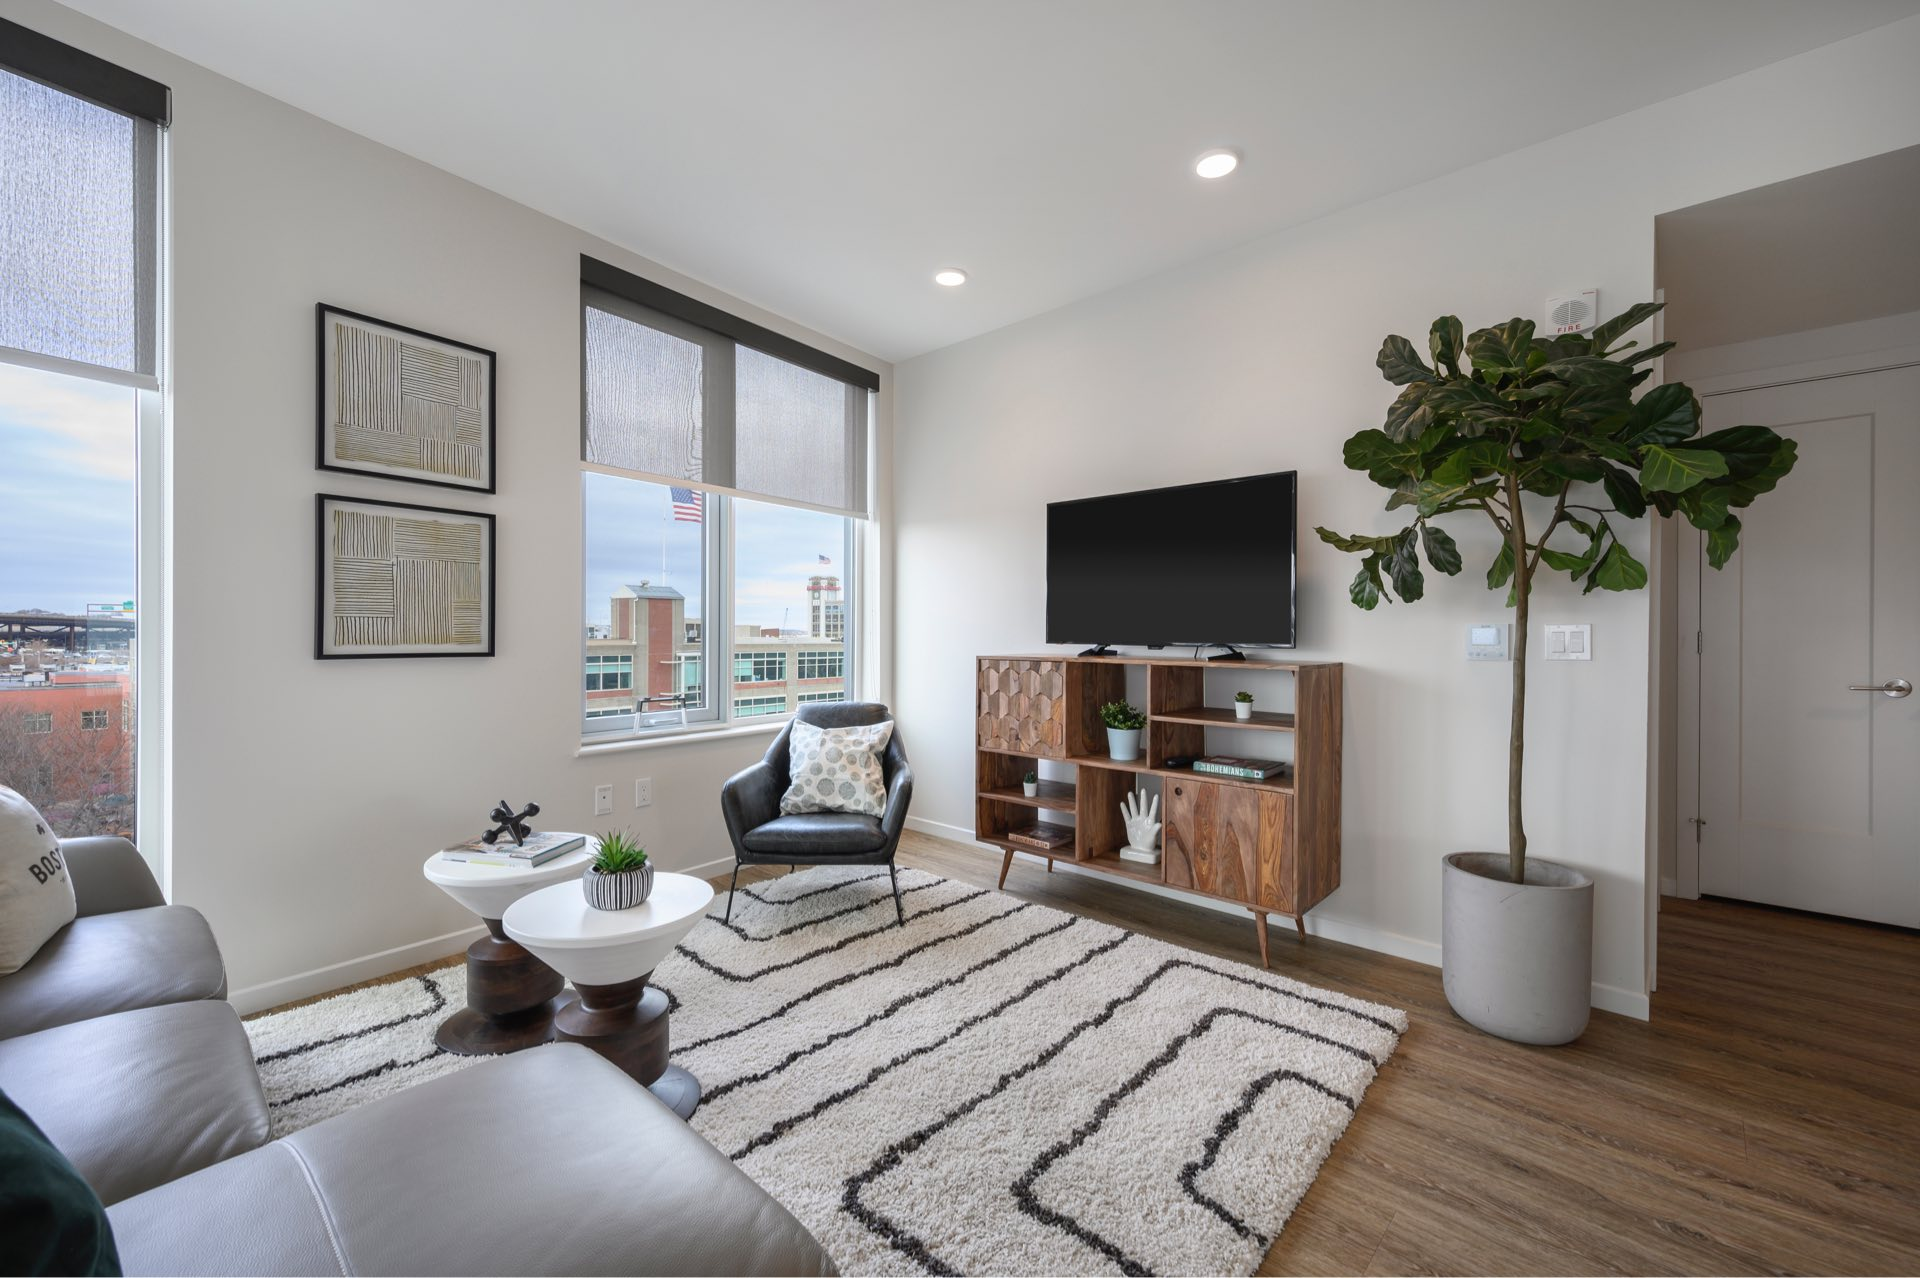 Apartments img 30